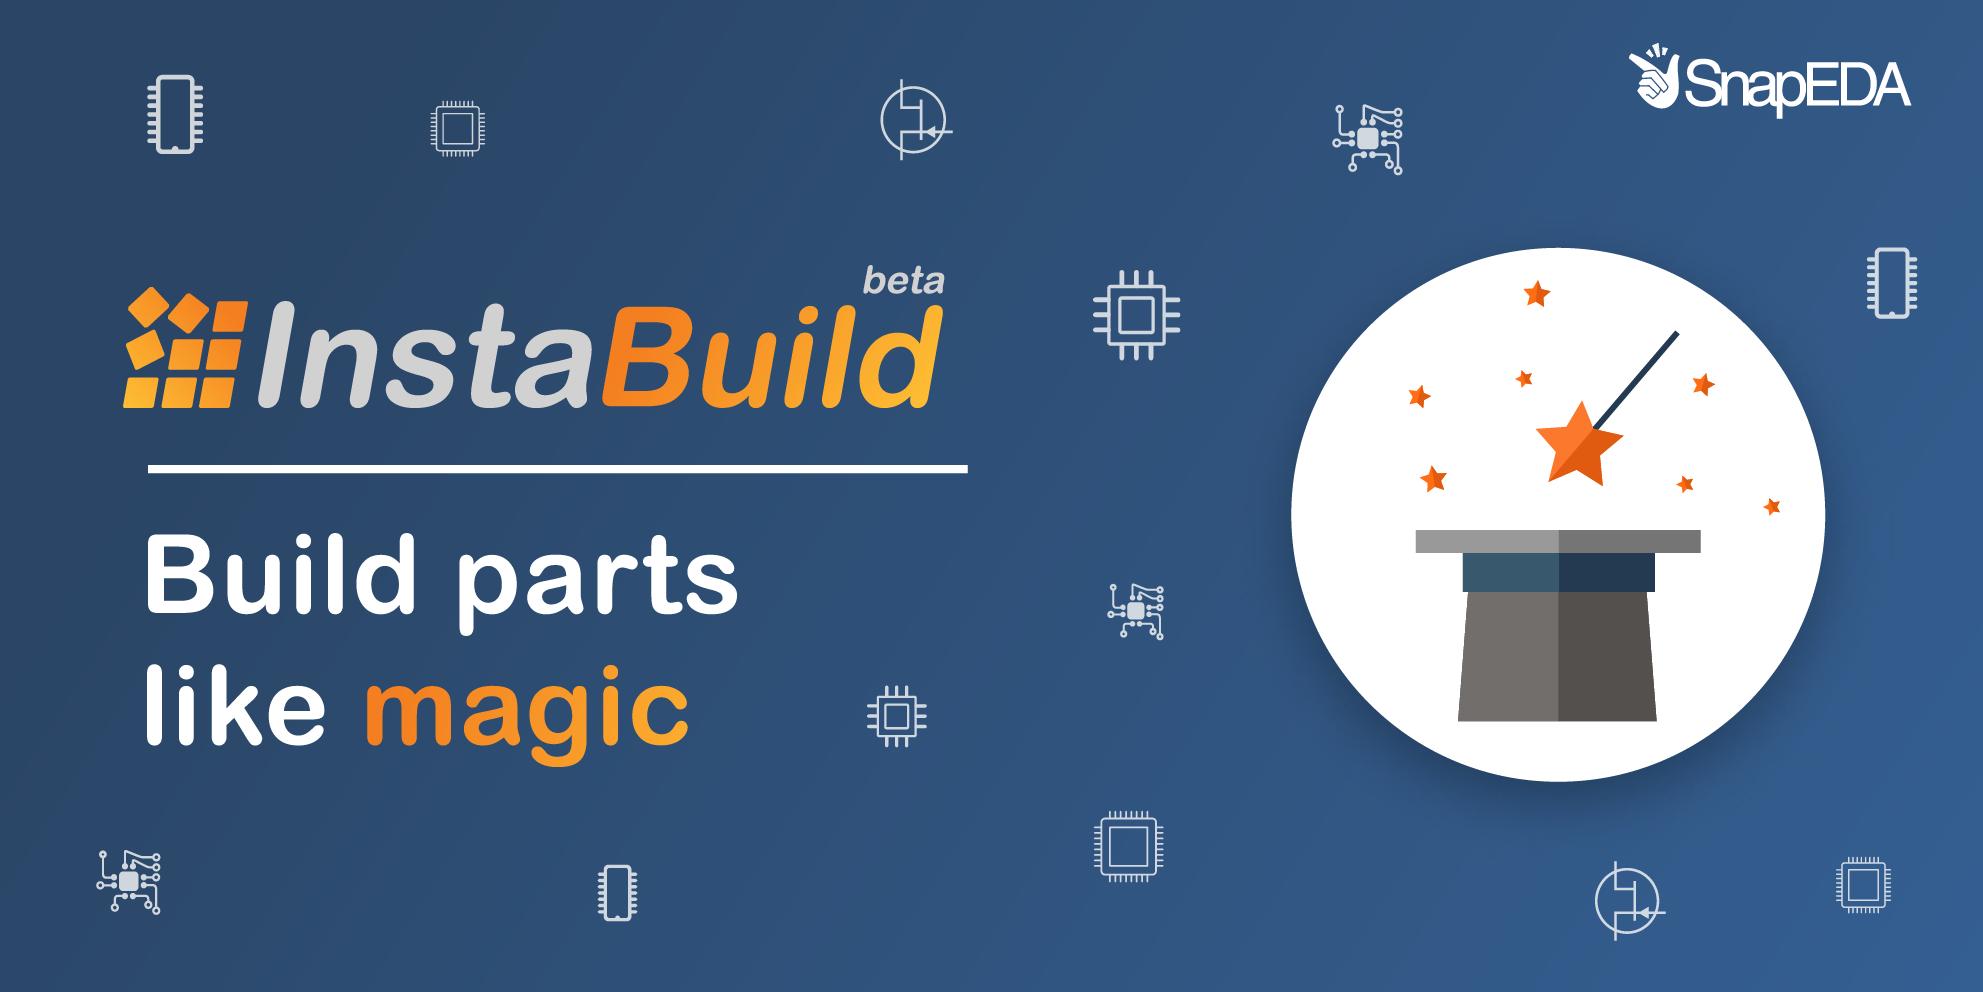 Use computer vision to automate parts! - SnapEDA Blog